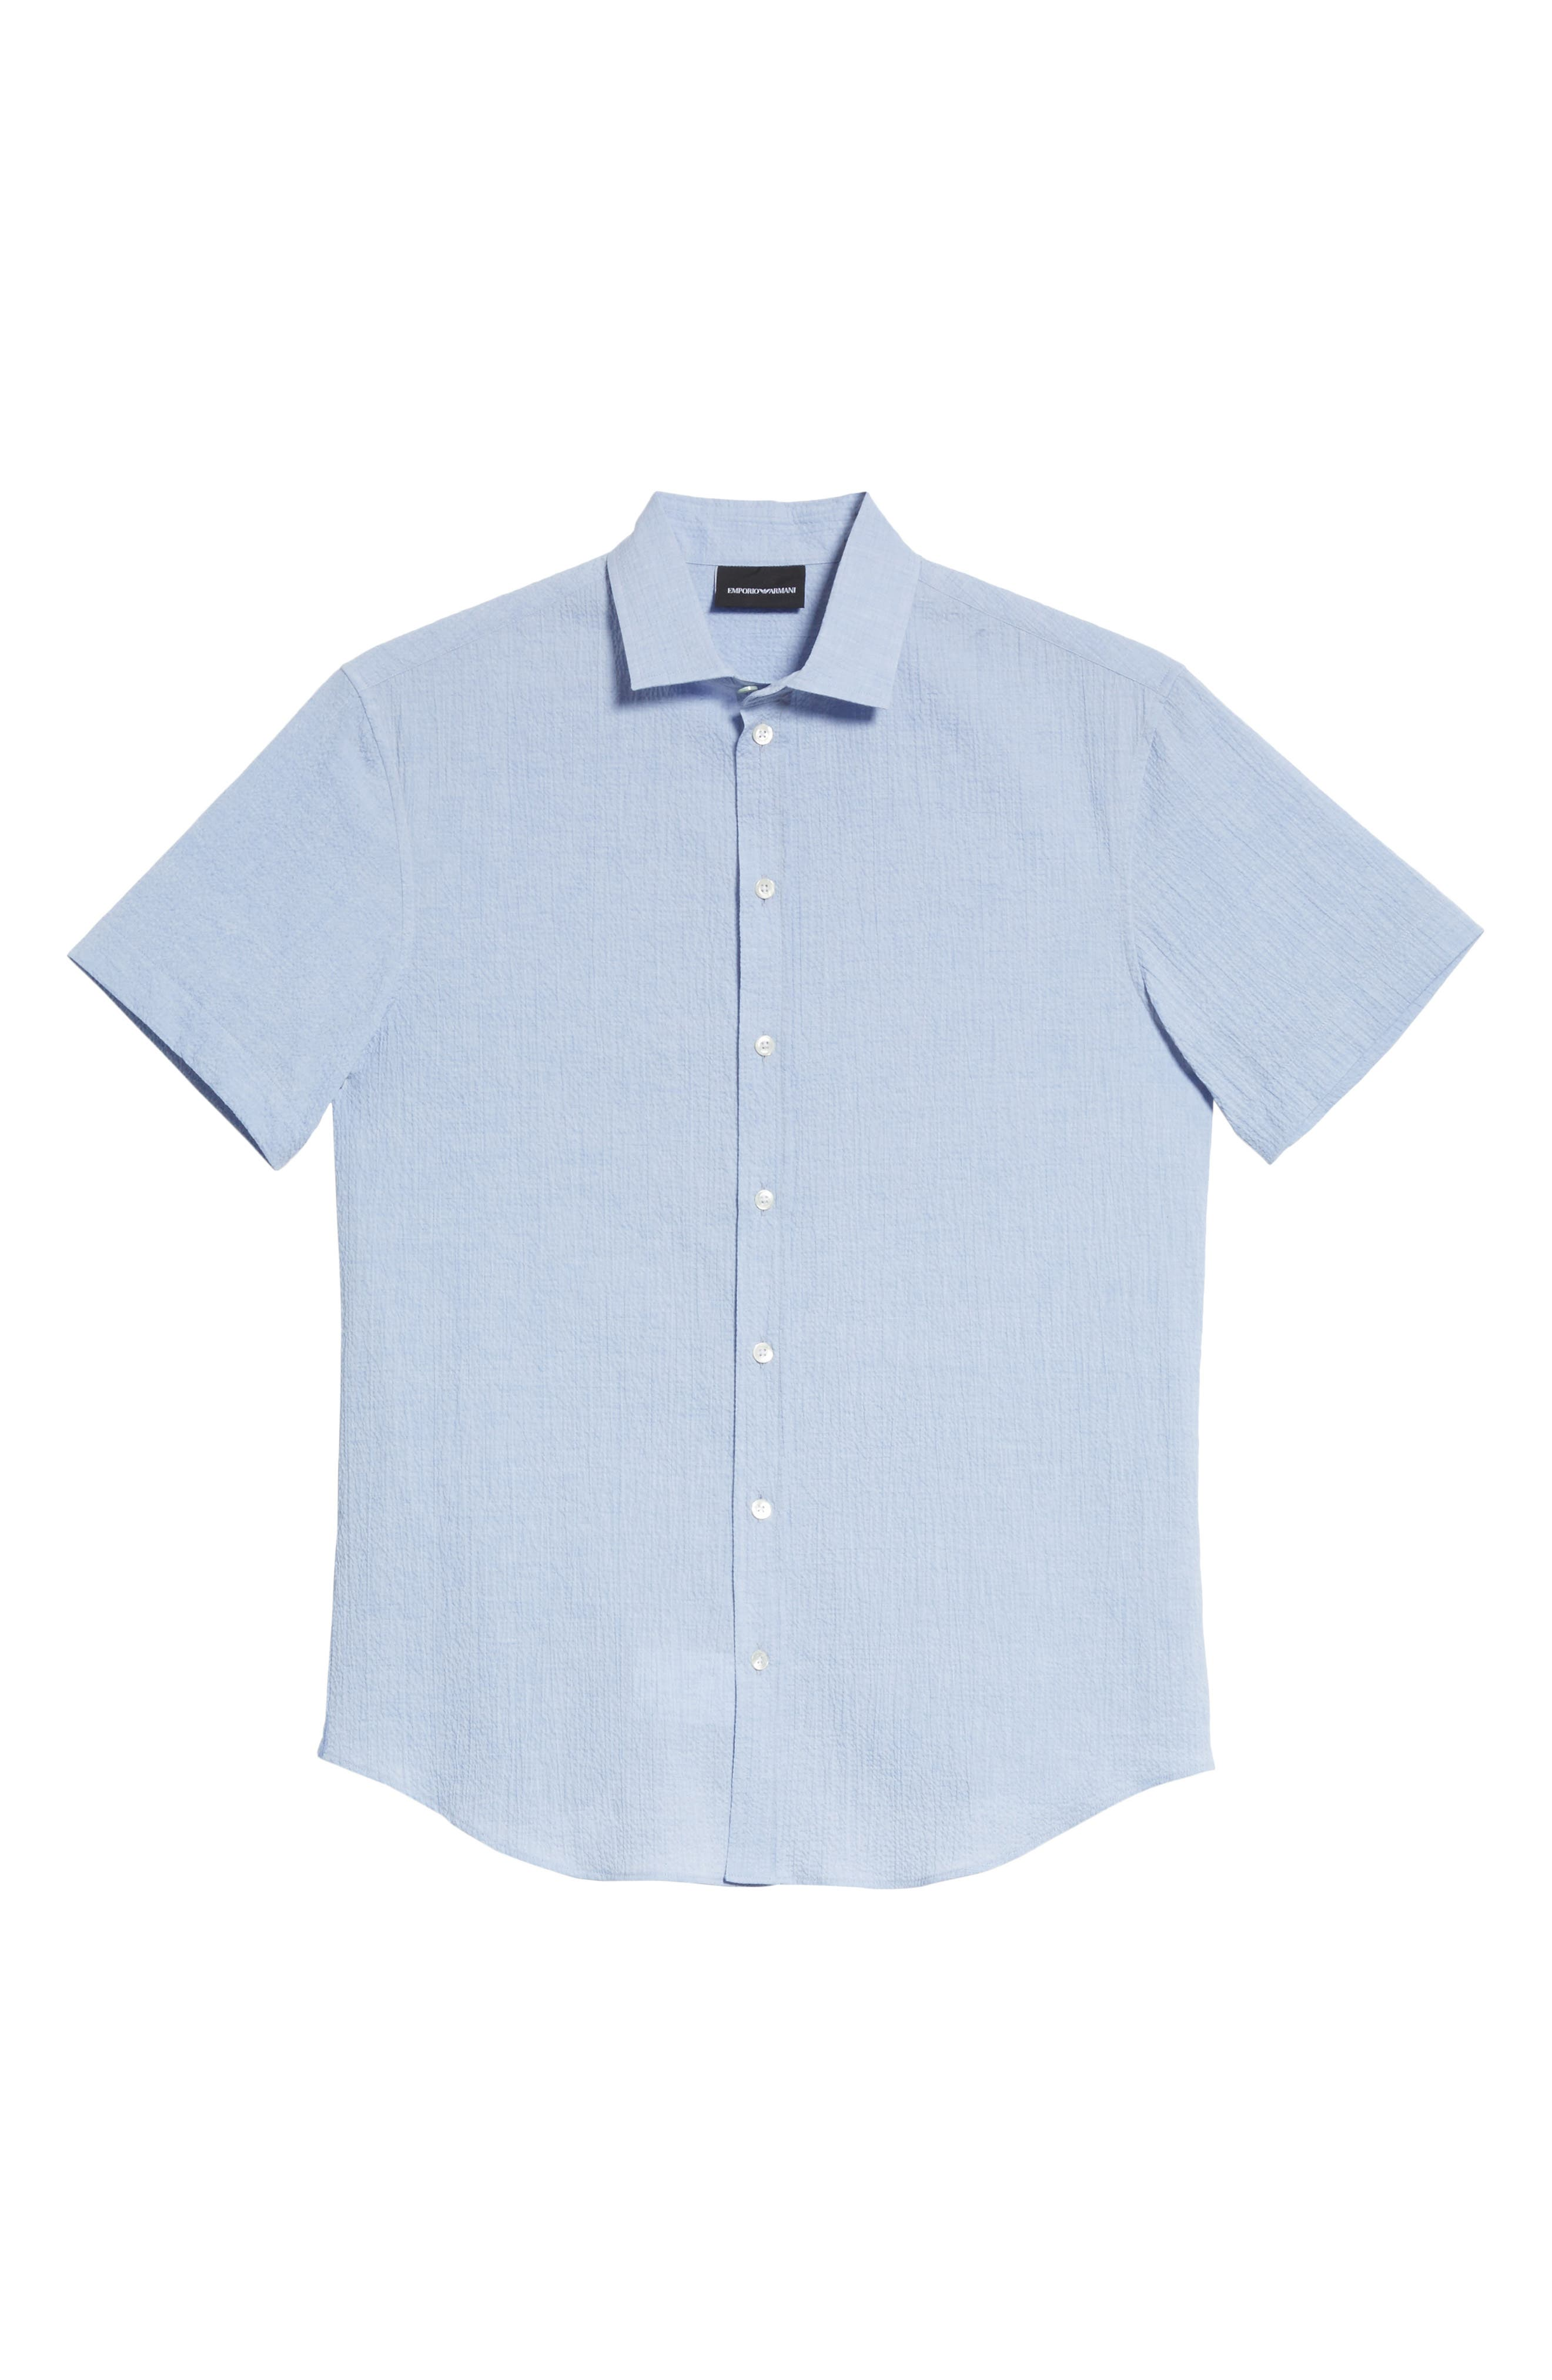 Regular Fit Seersucker Sport Shirt,                             Alternate thumbnail 6, color,